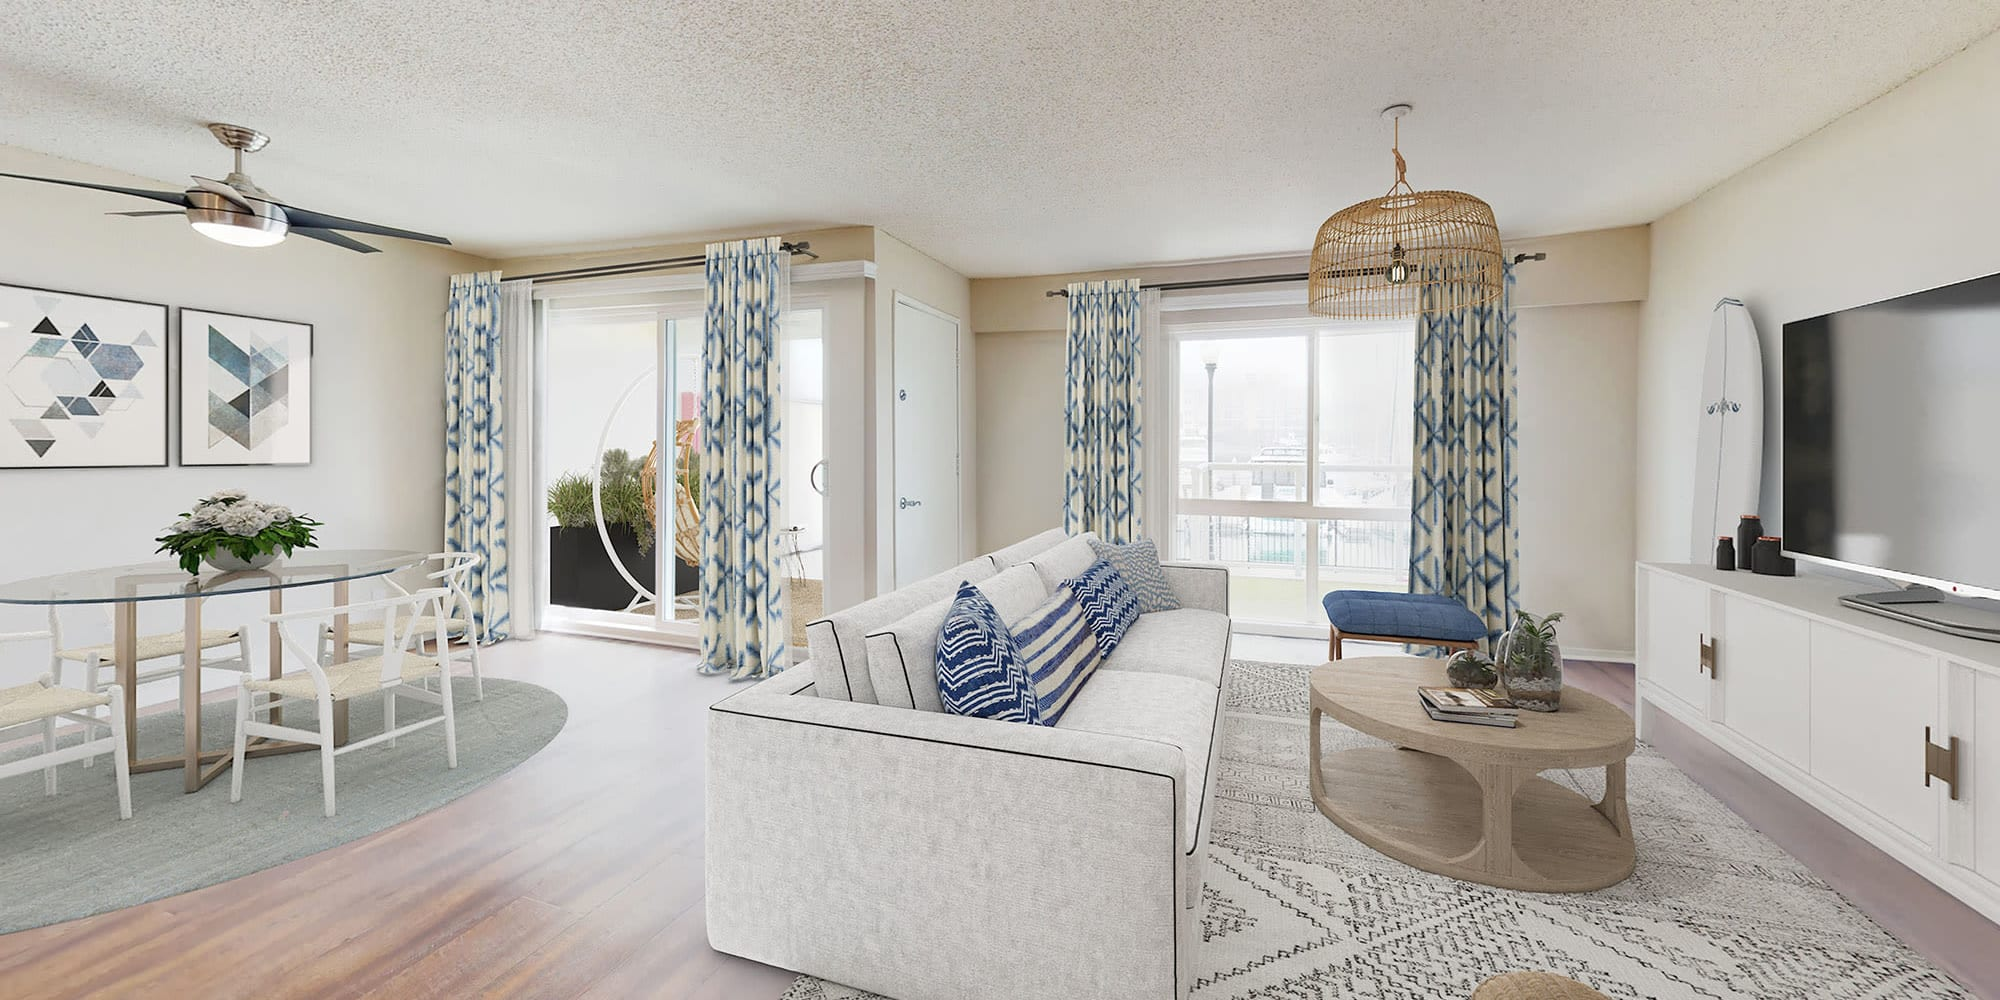 Spacious living room and dining area at The Tides at Marina Harbor in Marina del Rey, California